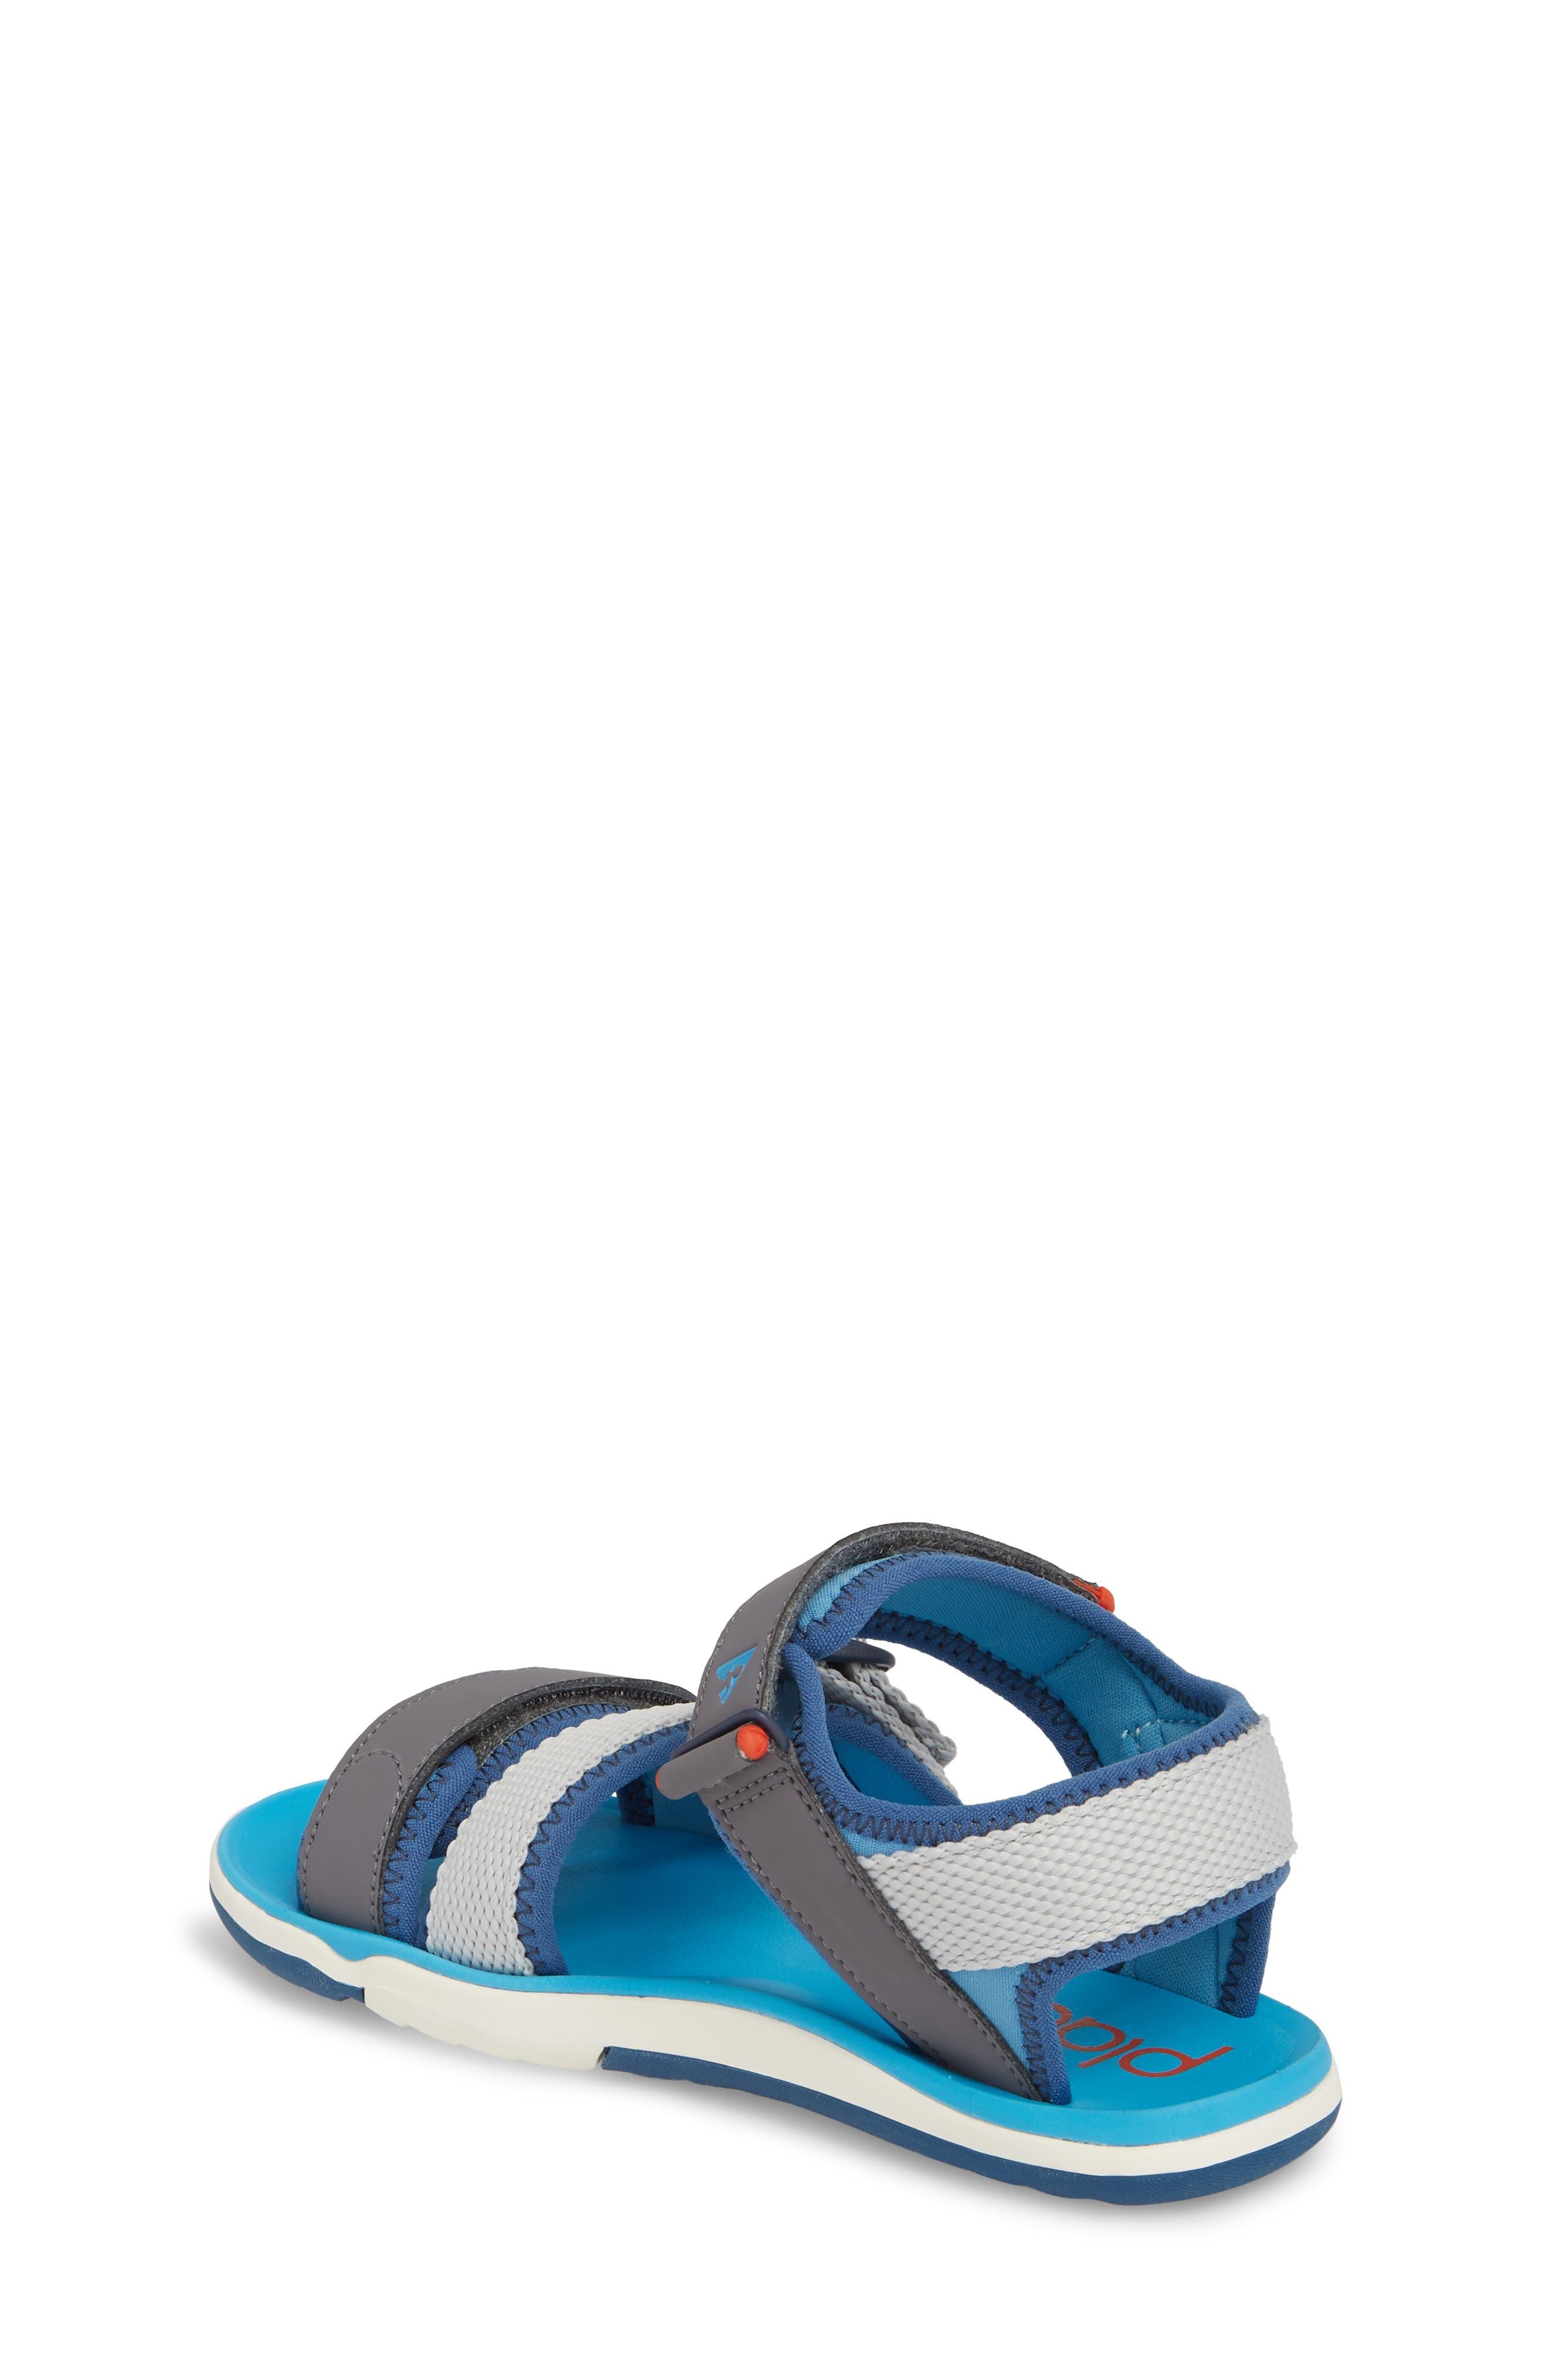 Wes Customizable Sandal,                             Alternate thumbnail 3, color,                             Aloha Blue